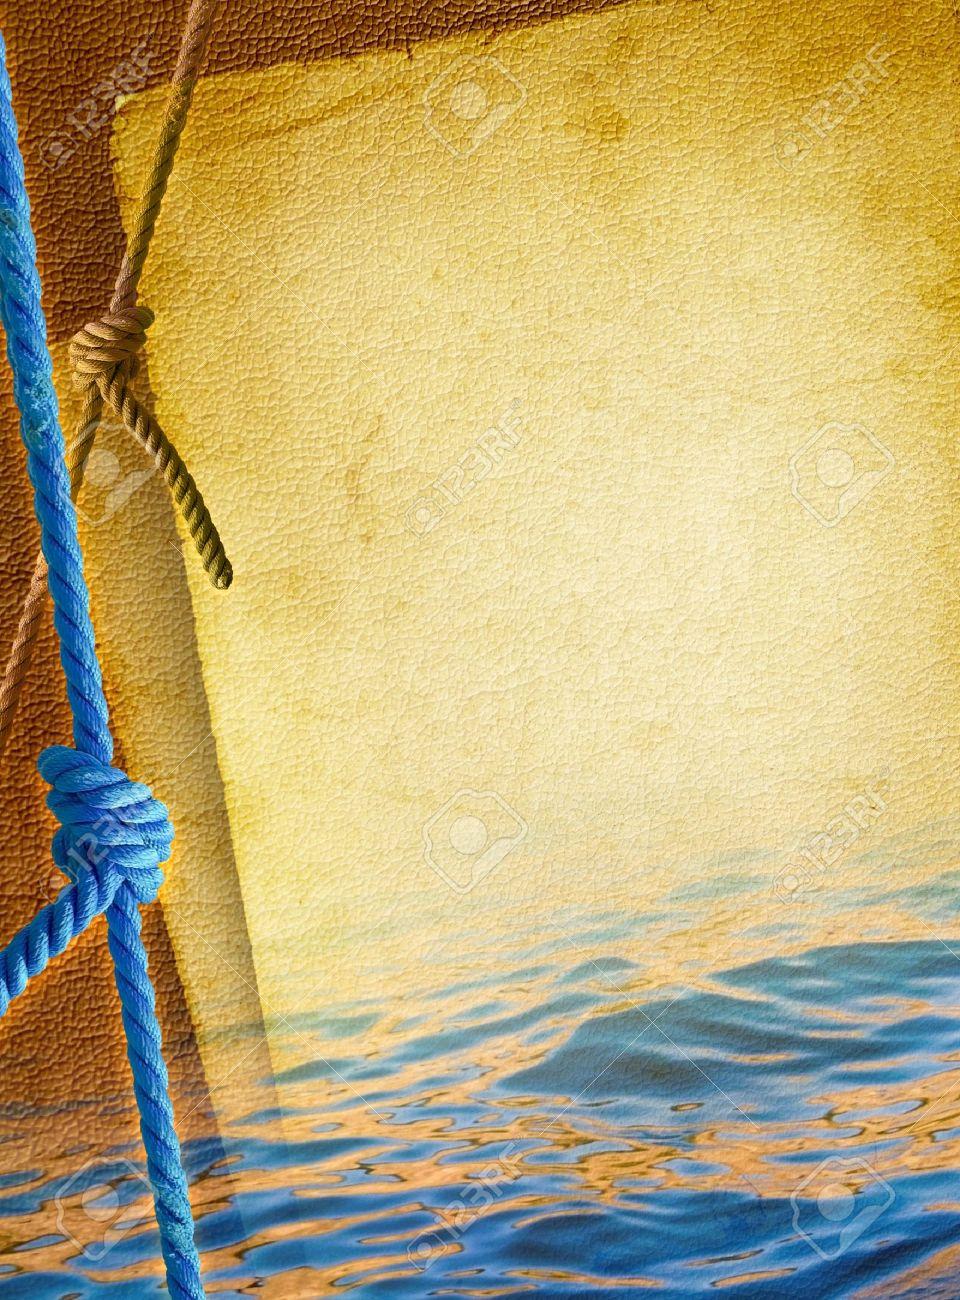 By The Sea Vintage Background Desktop Background Wallpaper Free